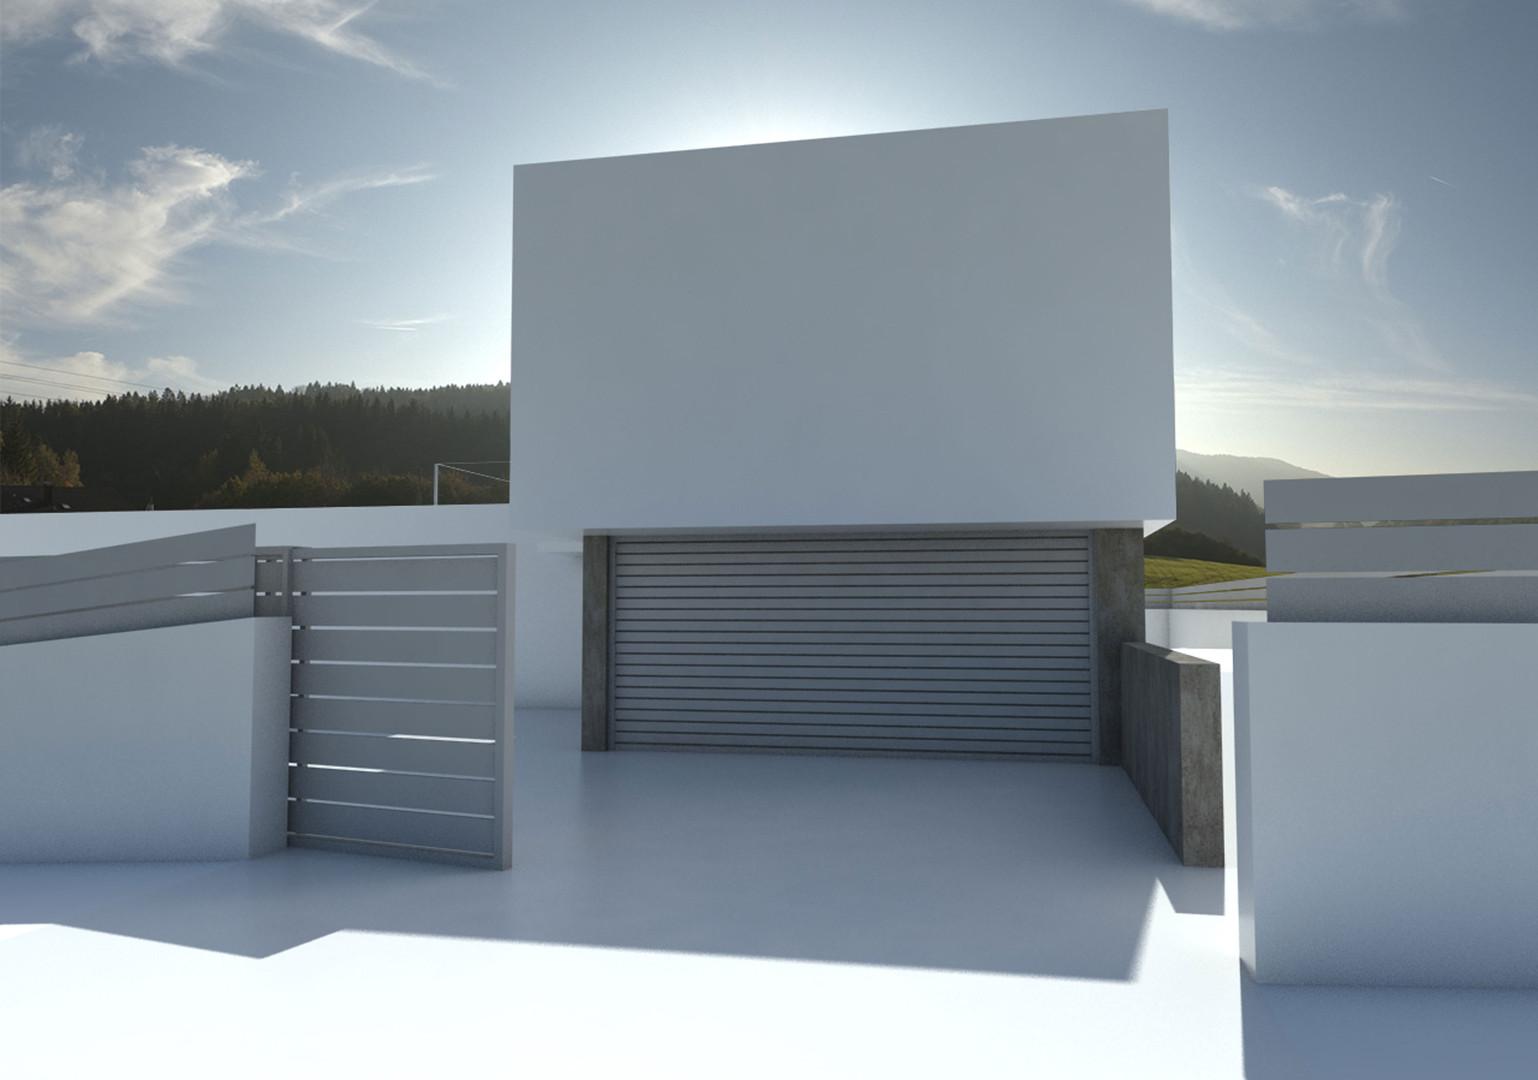 arquitectura-senmais-16.02.07.jpg